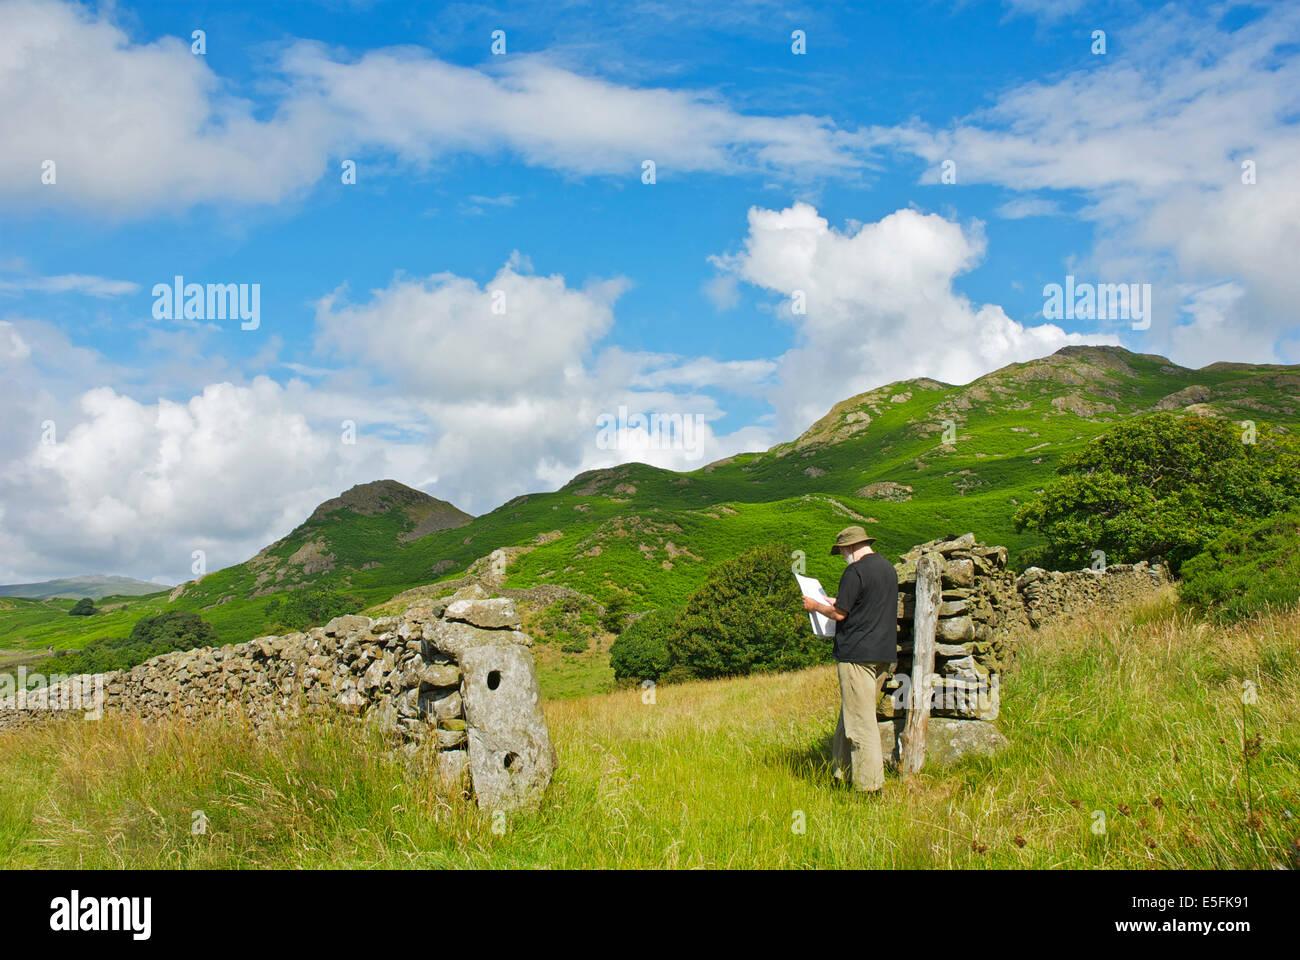 Map Of England Lake District.Ordnance Survey Map And Lake District Stock Photos Ordnance Survey